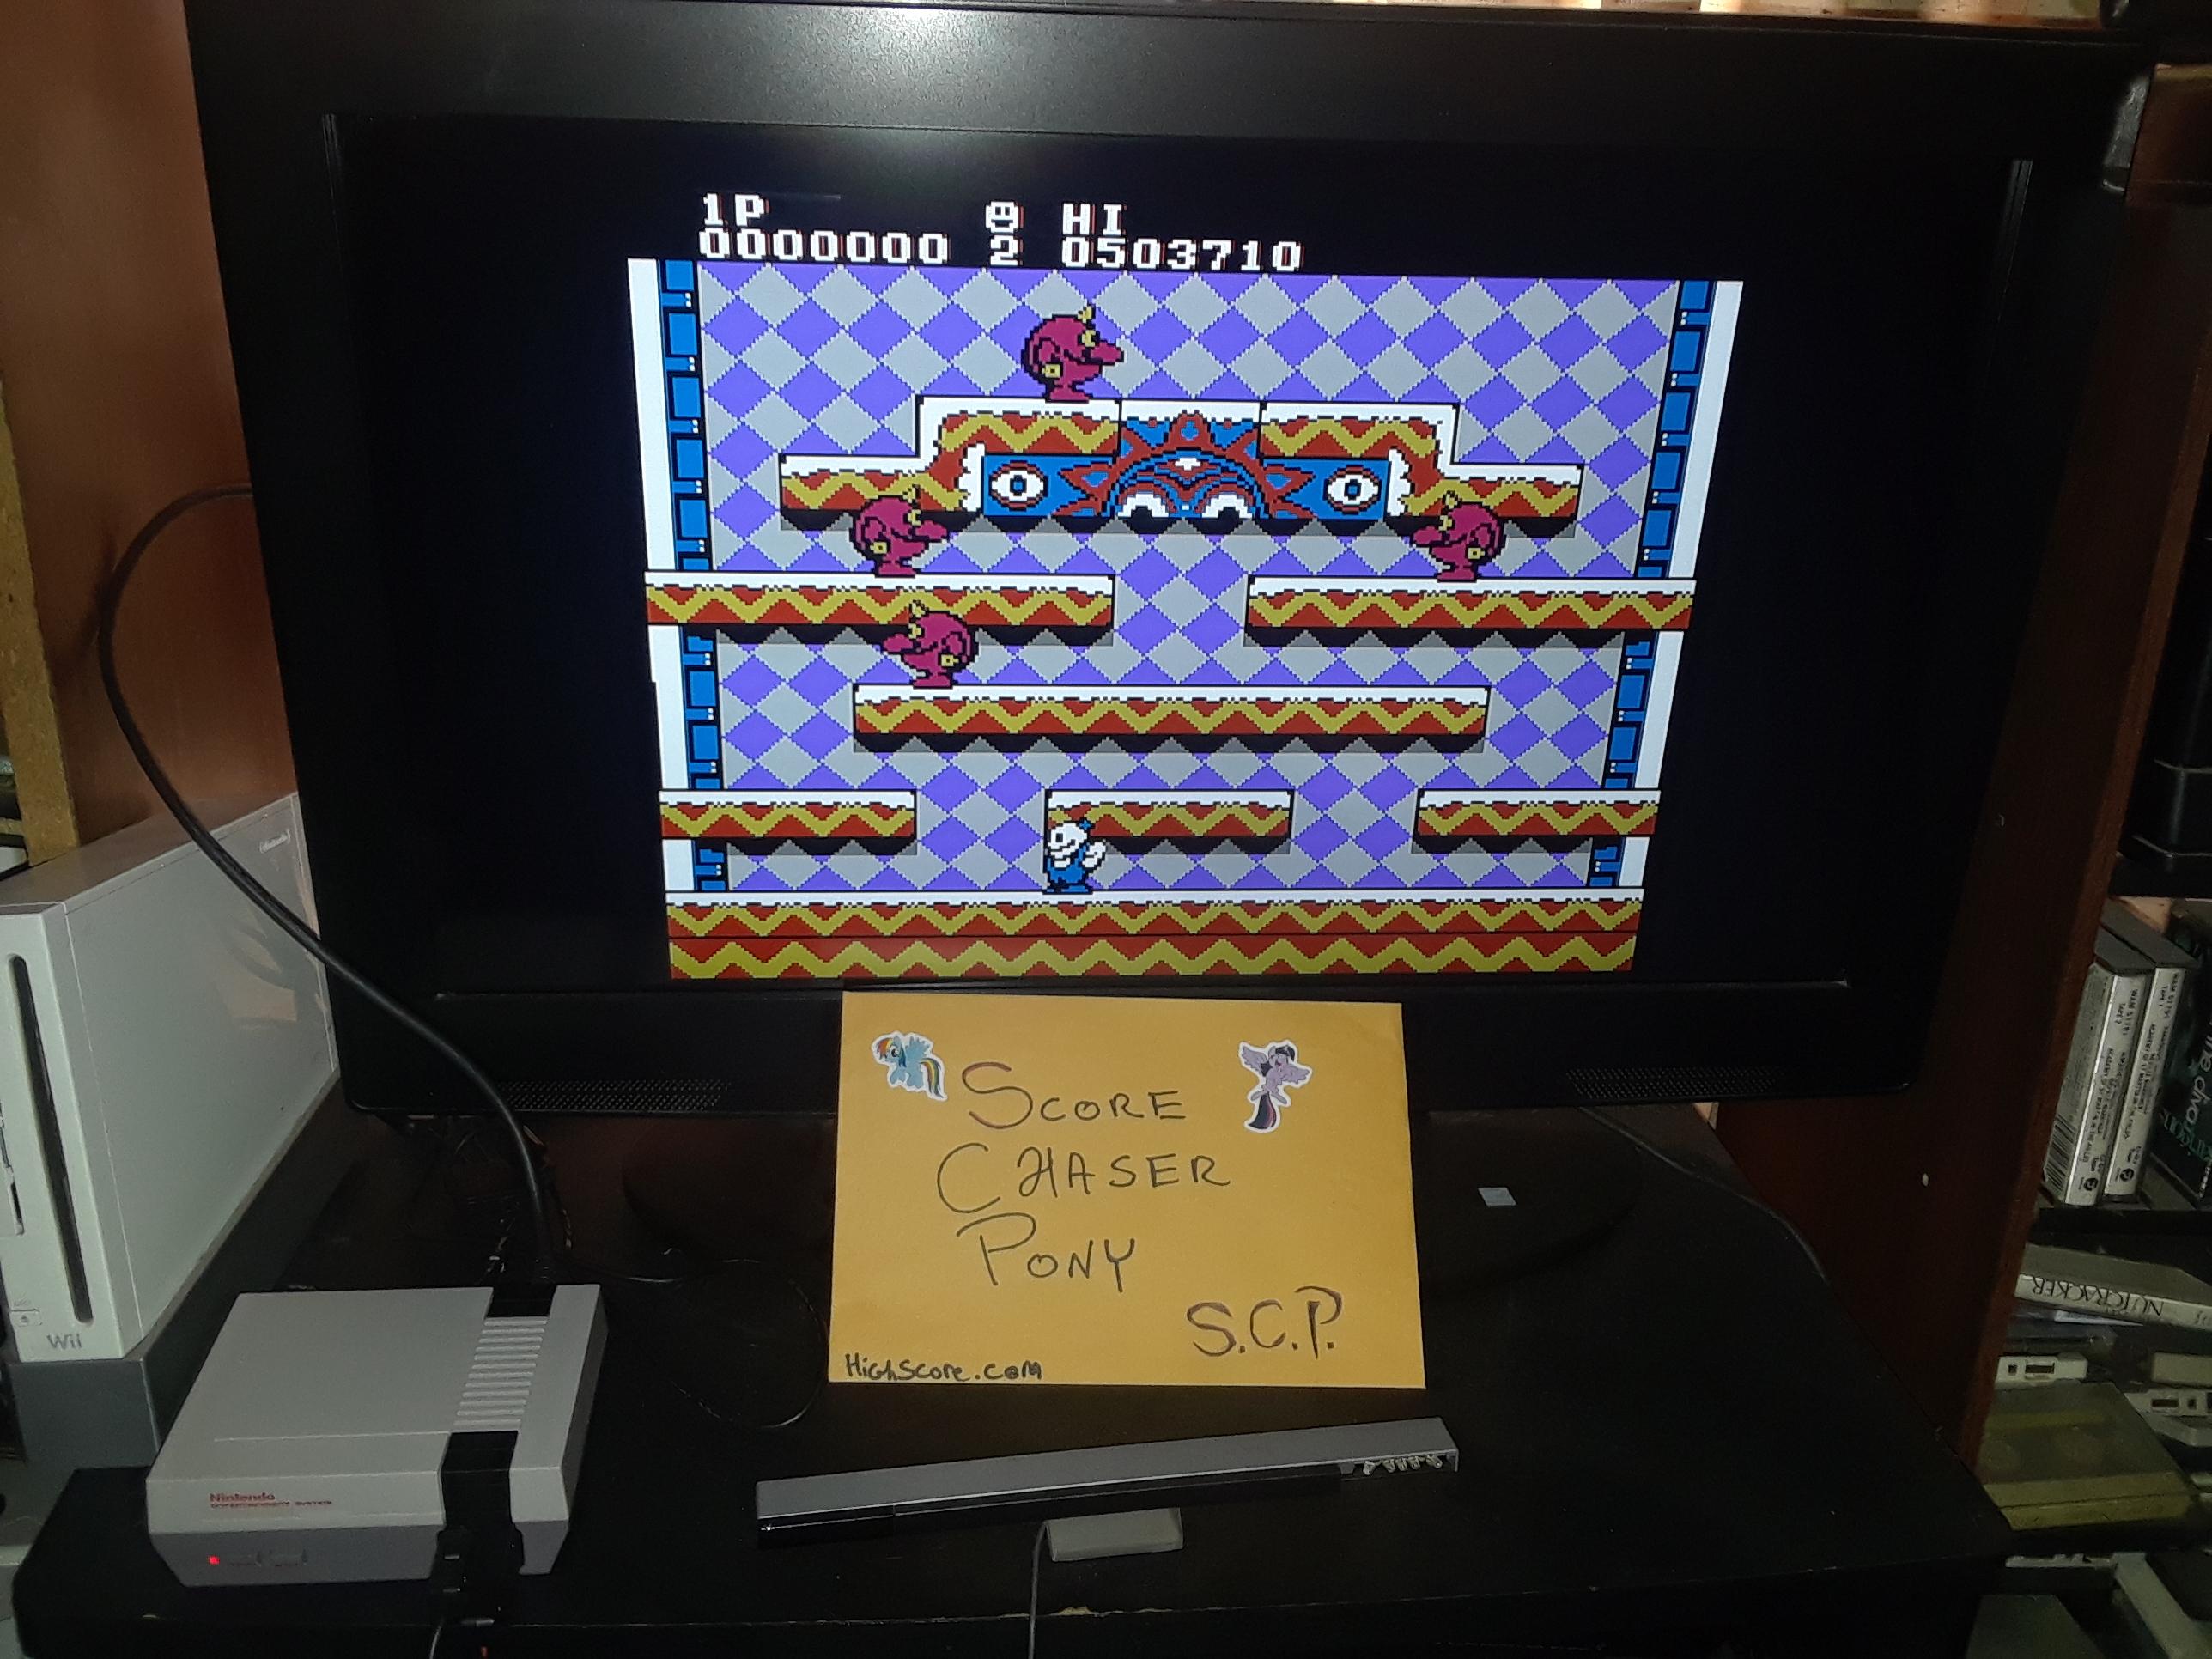 Scorechaserpony: Snow Bros. (NES/Famicom Emulated) 503,710 points on 2019-04-03 16:11:47